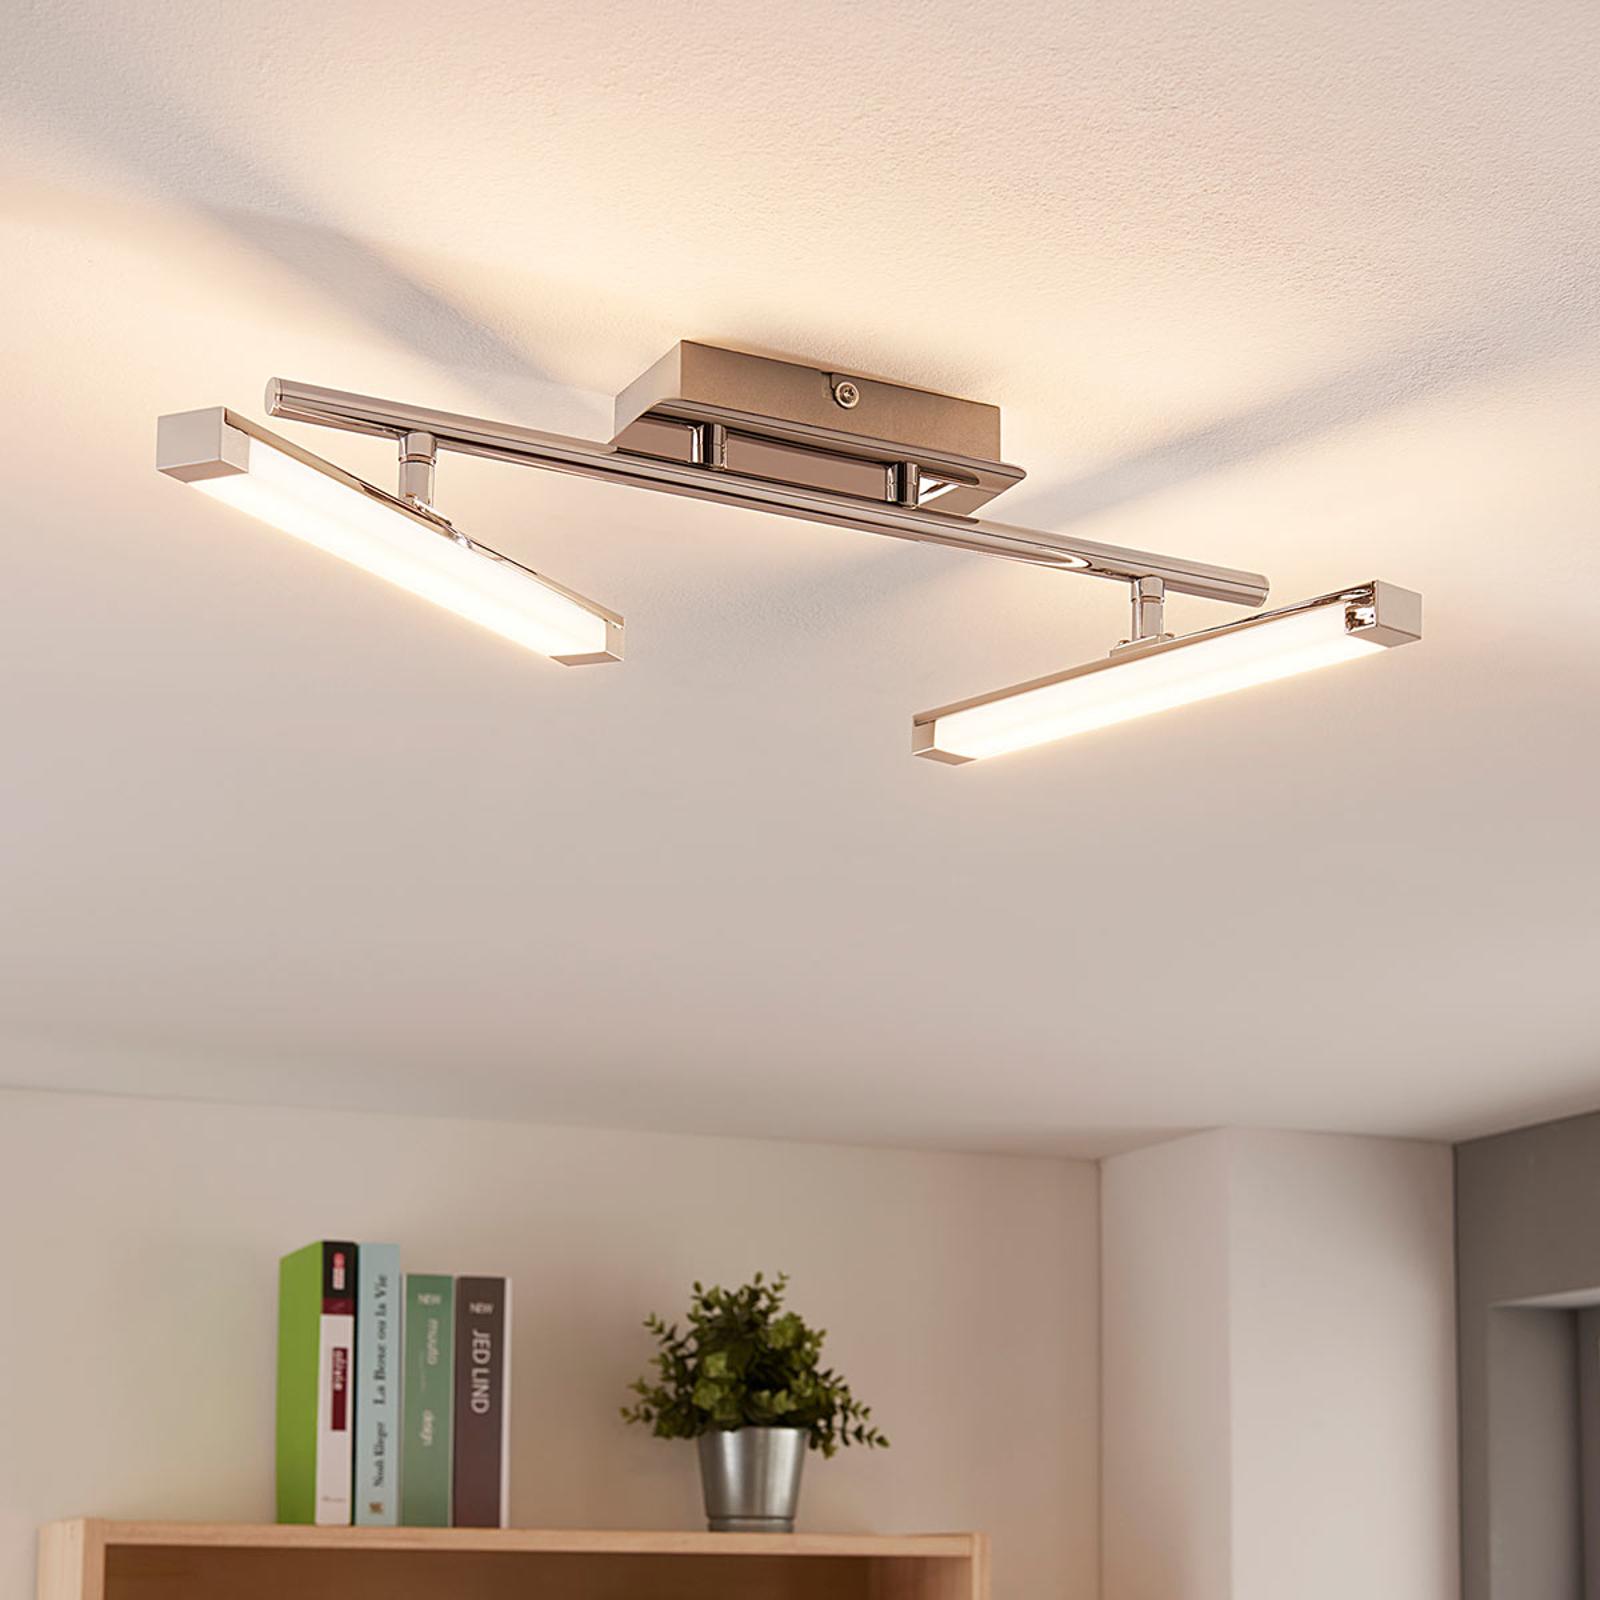 Lampa sufitowa LED Pilou, ściemniana 3-stopniowo